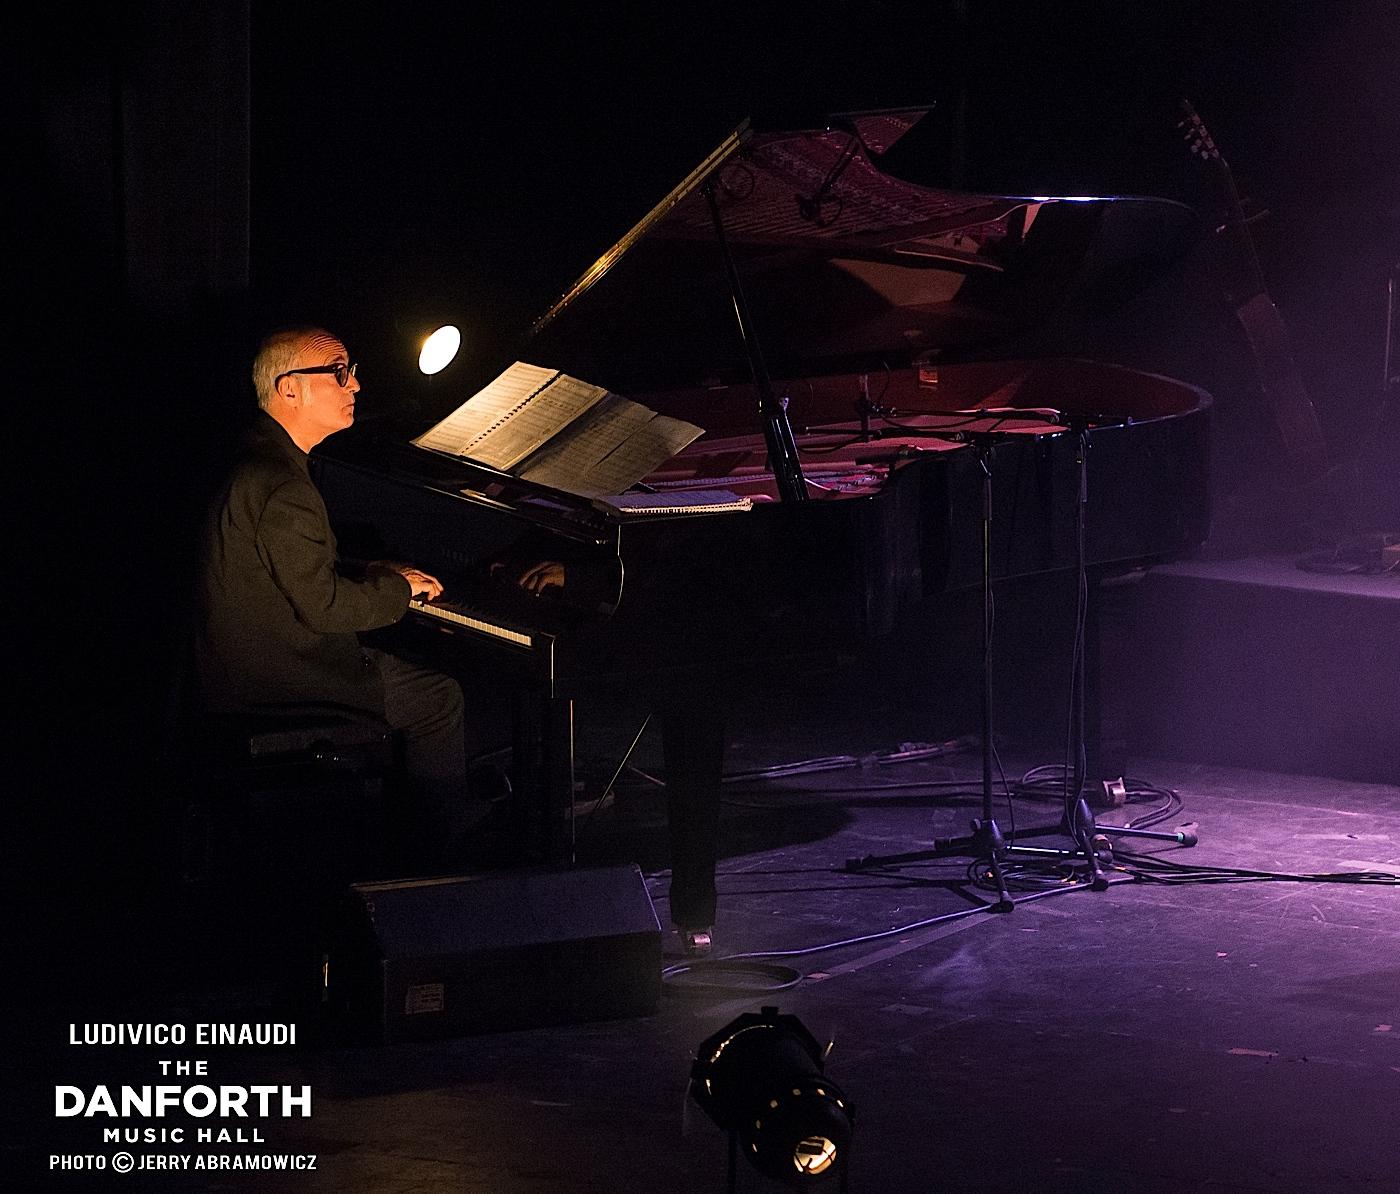 20130517 Ludivico Einaudi performs at The Danforth Music Hall Toronto 0177